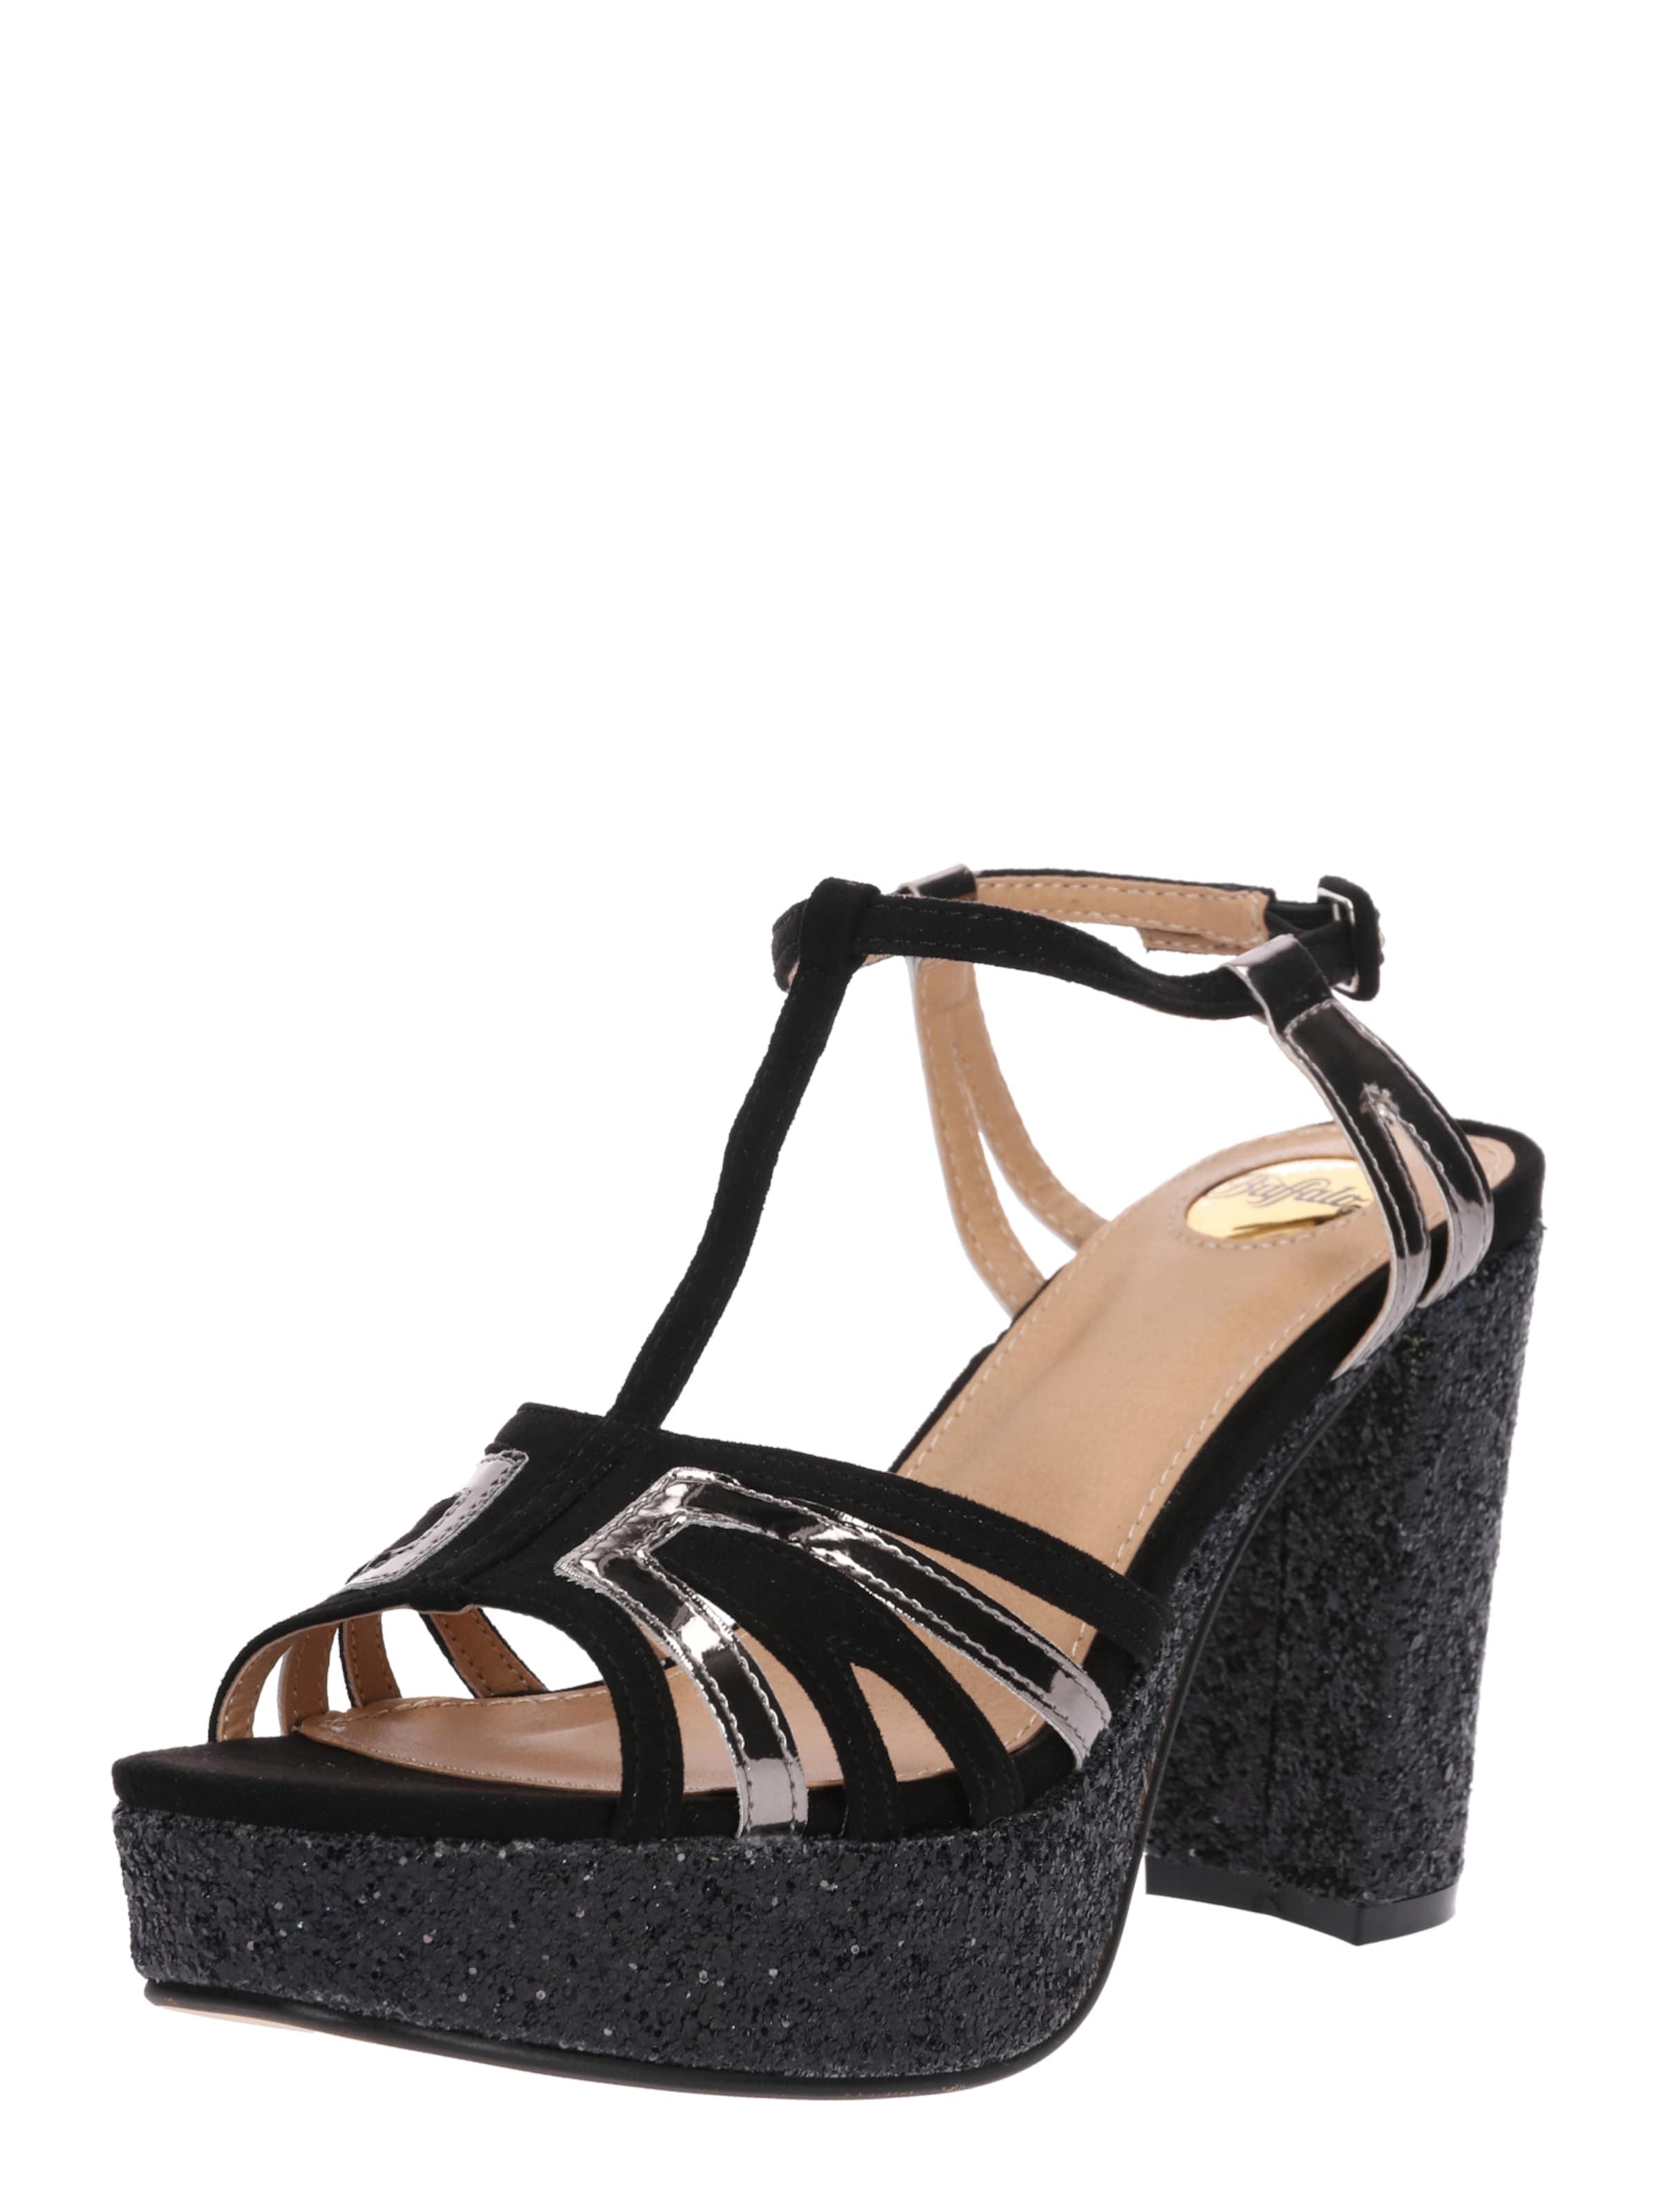 BUFFALO Sandalen Verschleißfeste billige Schuhe Hohe Qualität